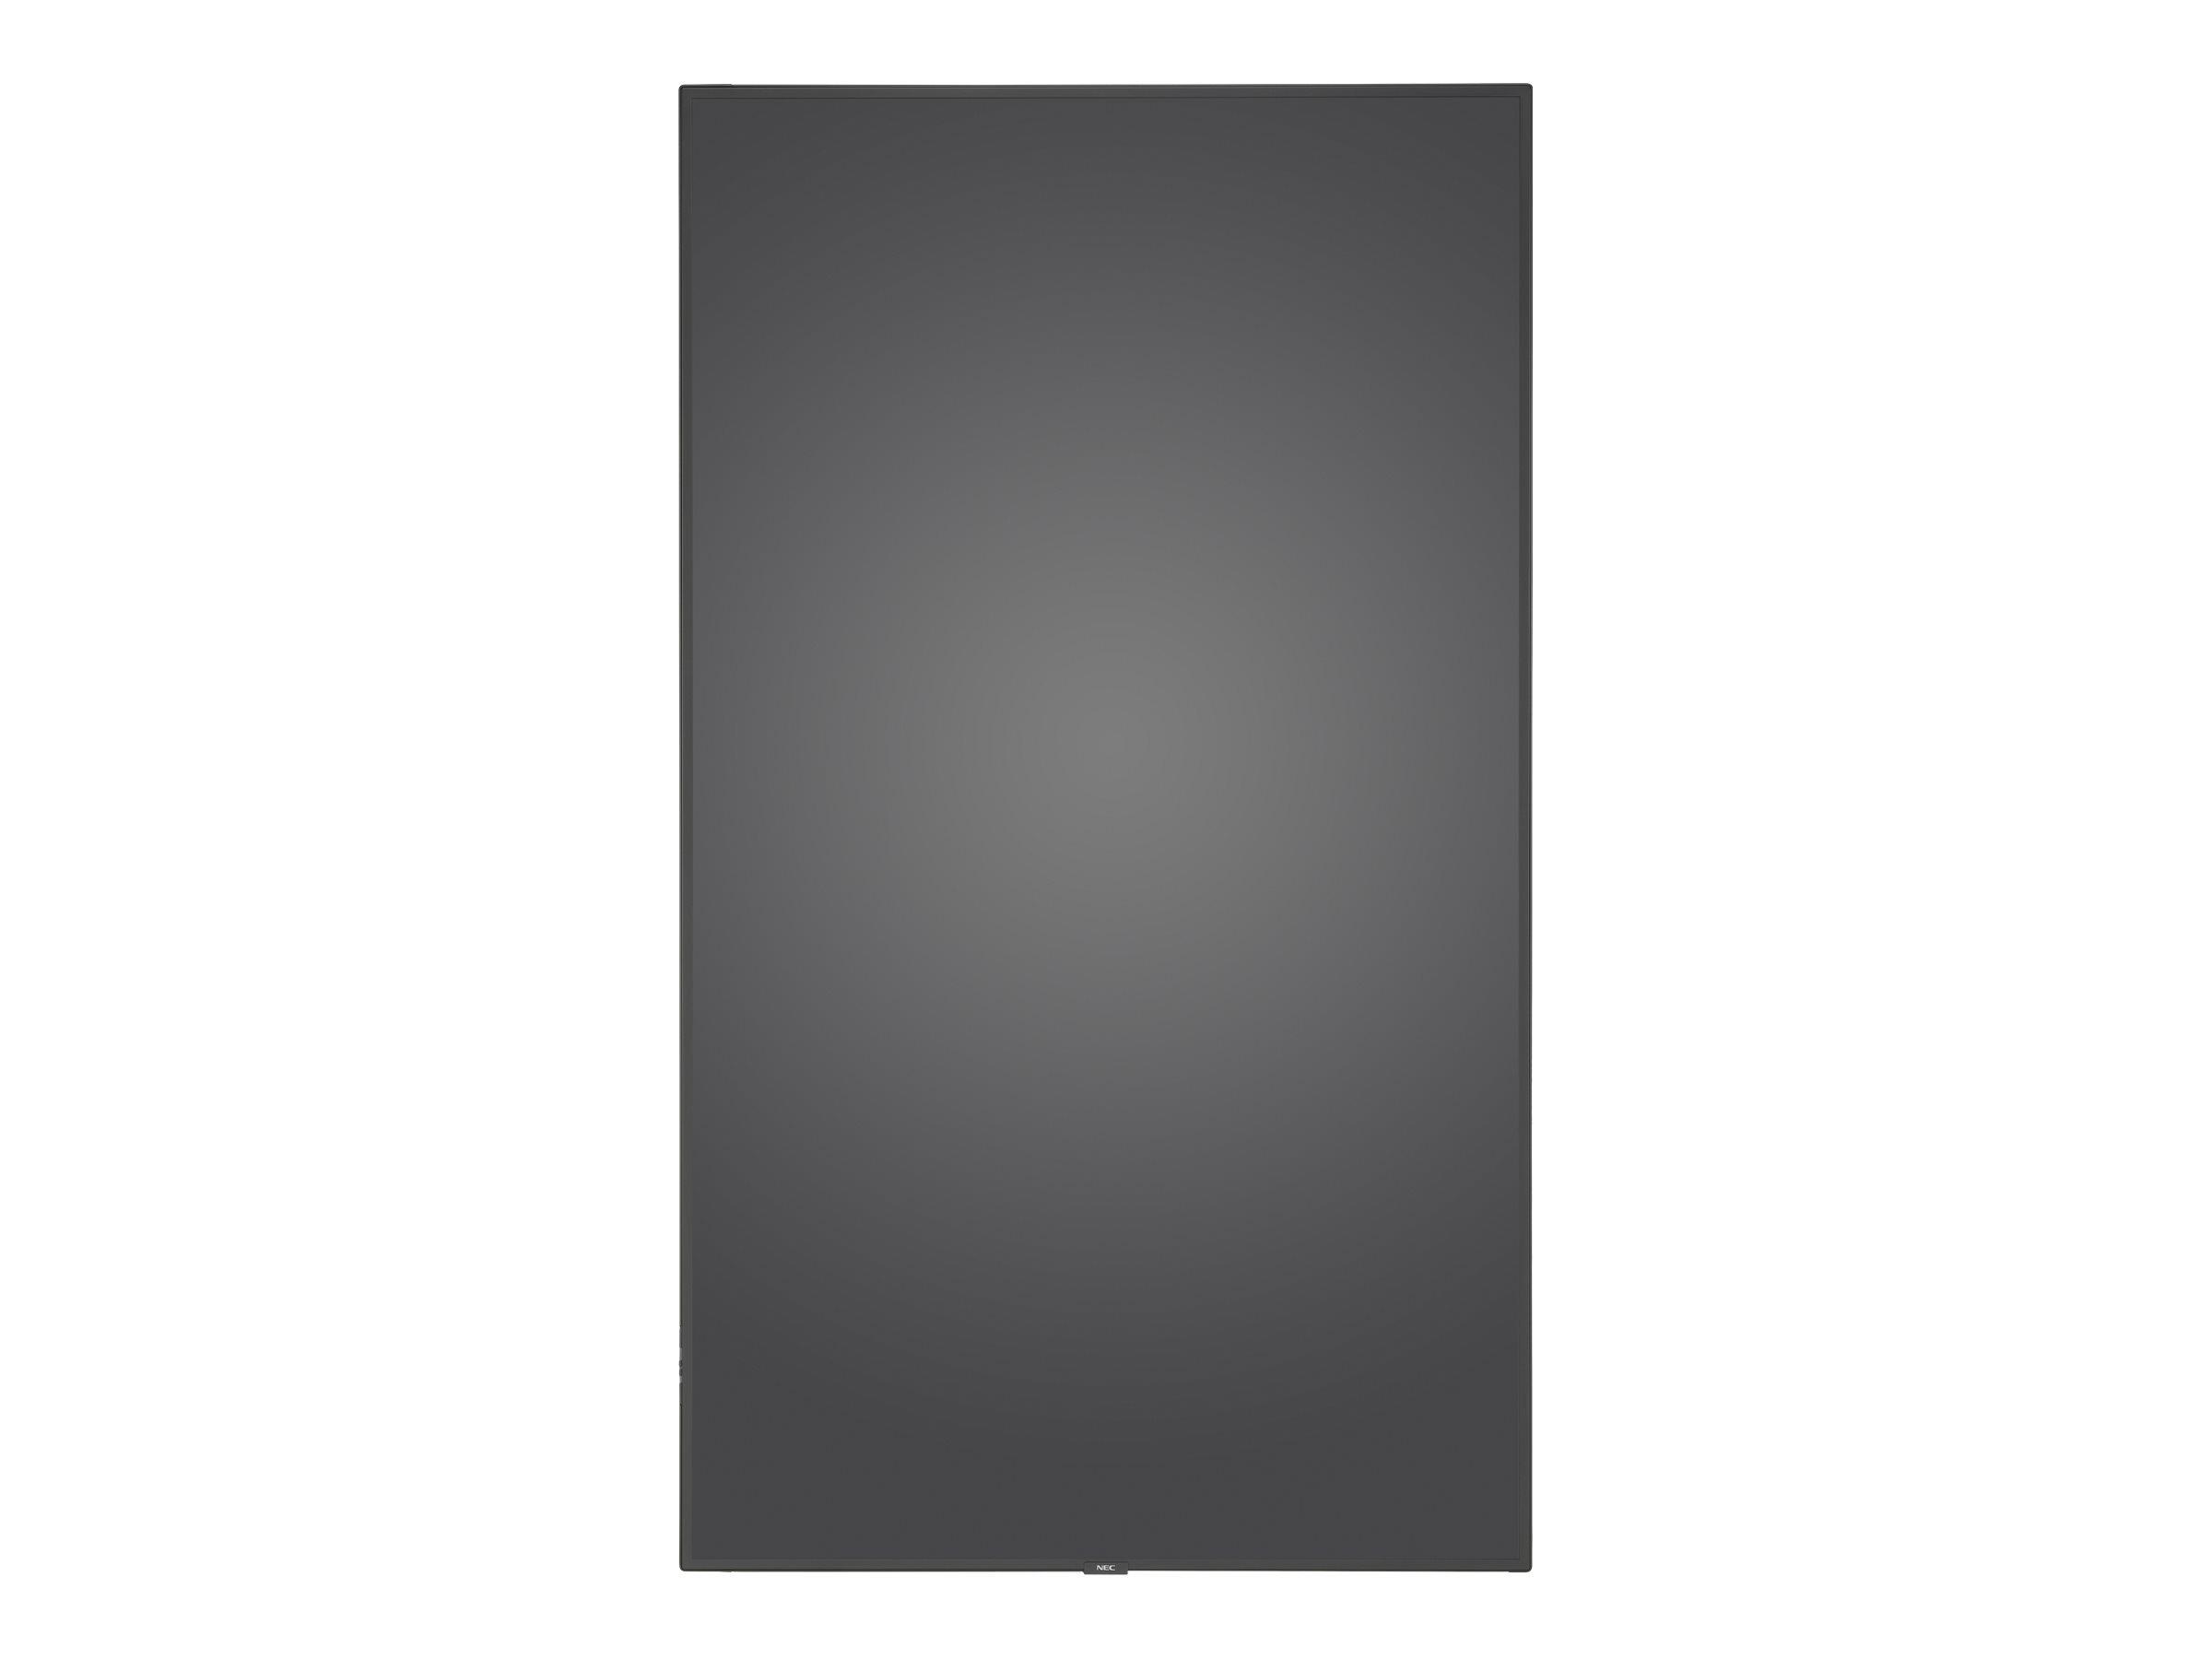 NEC MultiSync V554Q - 138.78 cm (55